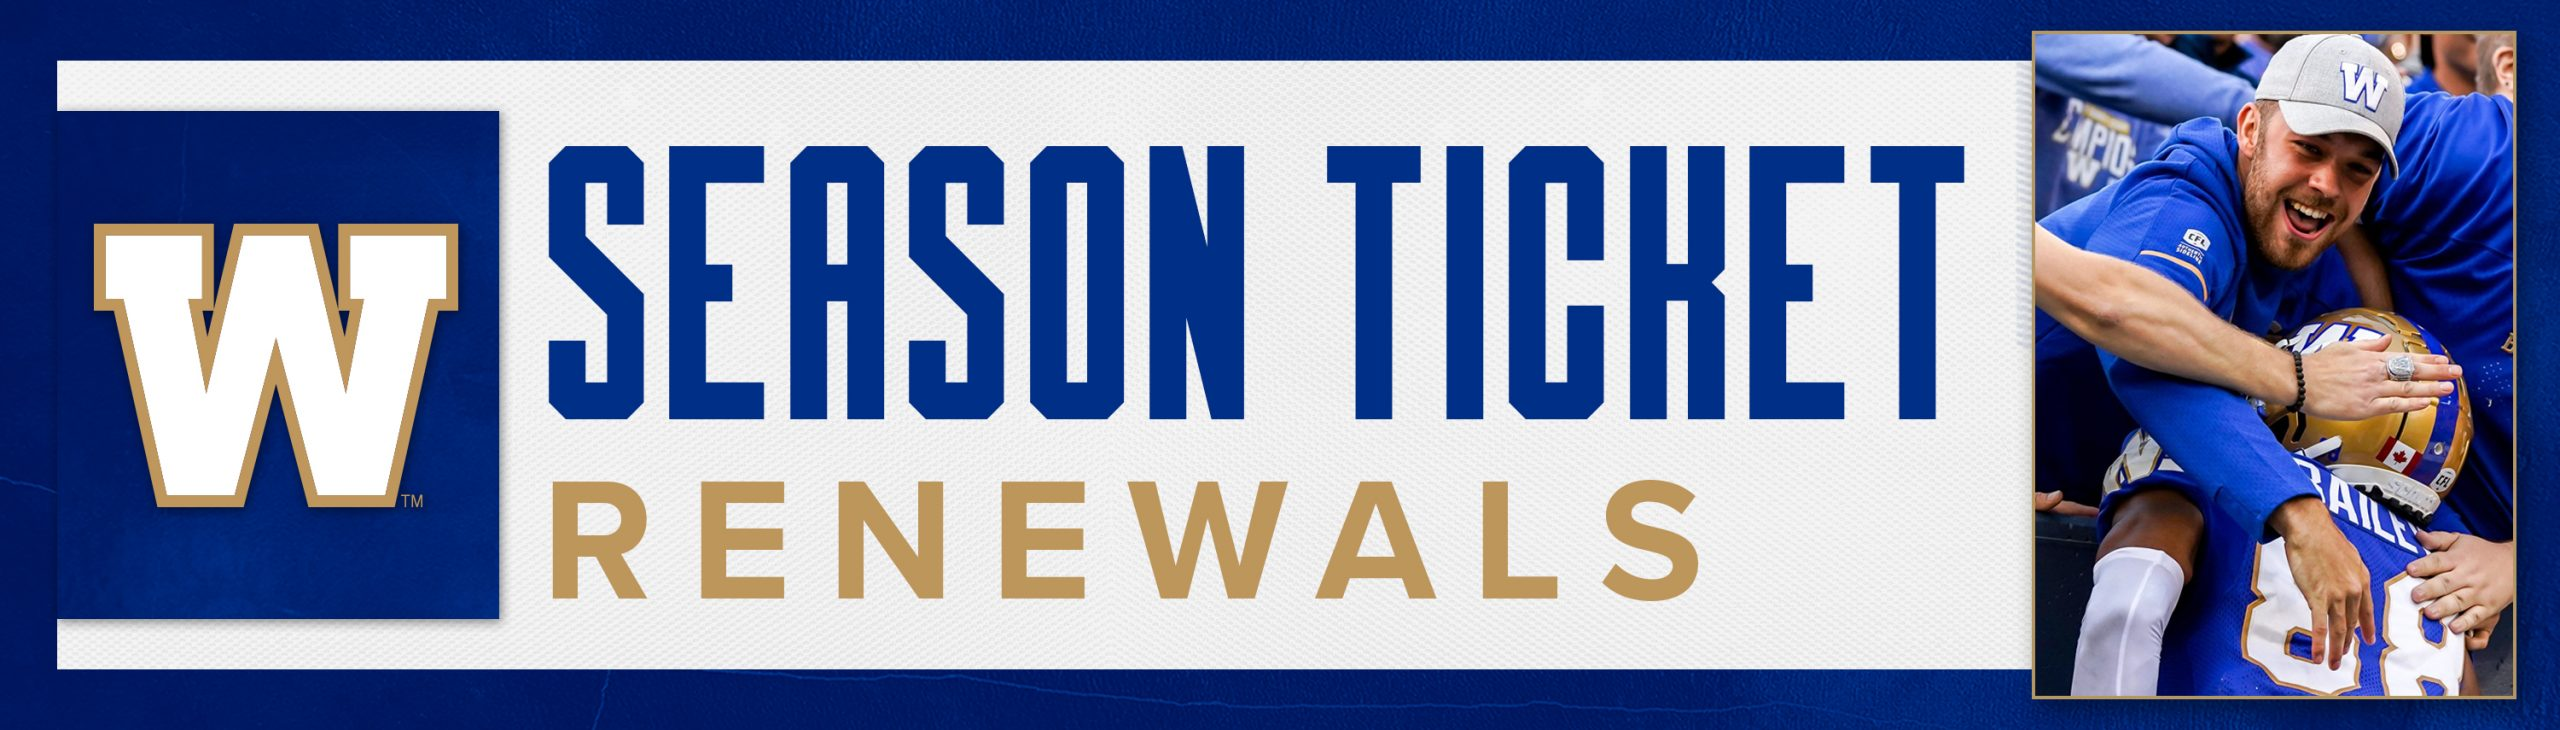 Winnipeg Blue Bombers Season Ticket Renewal for 2022